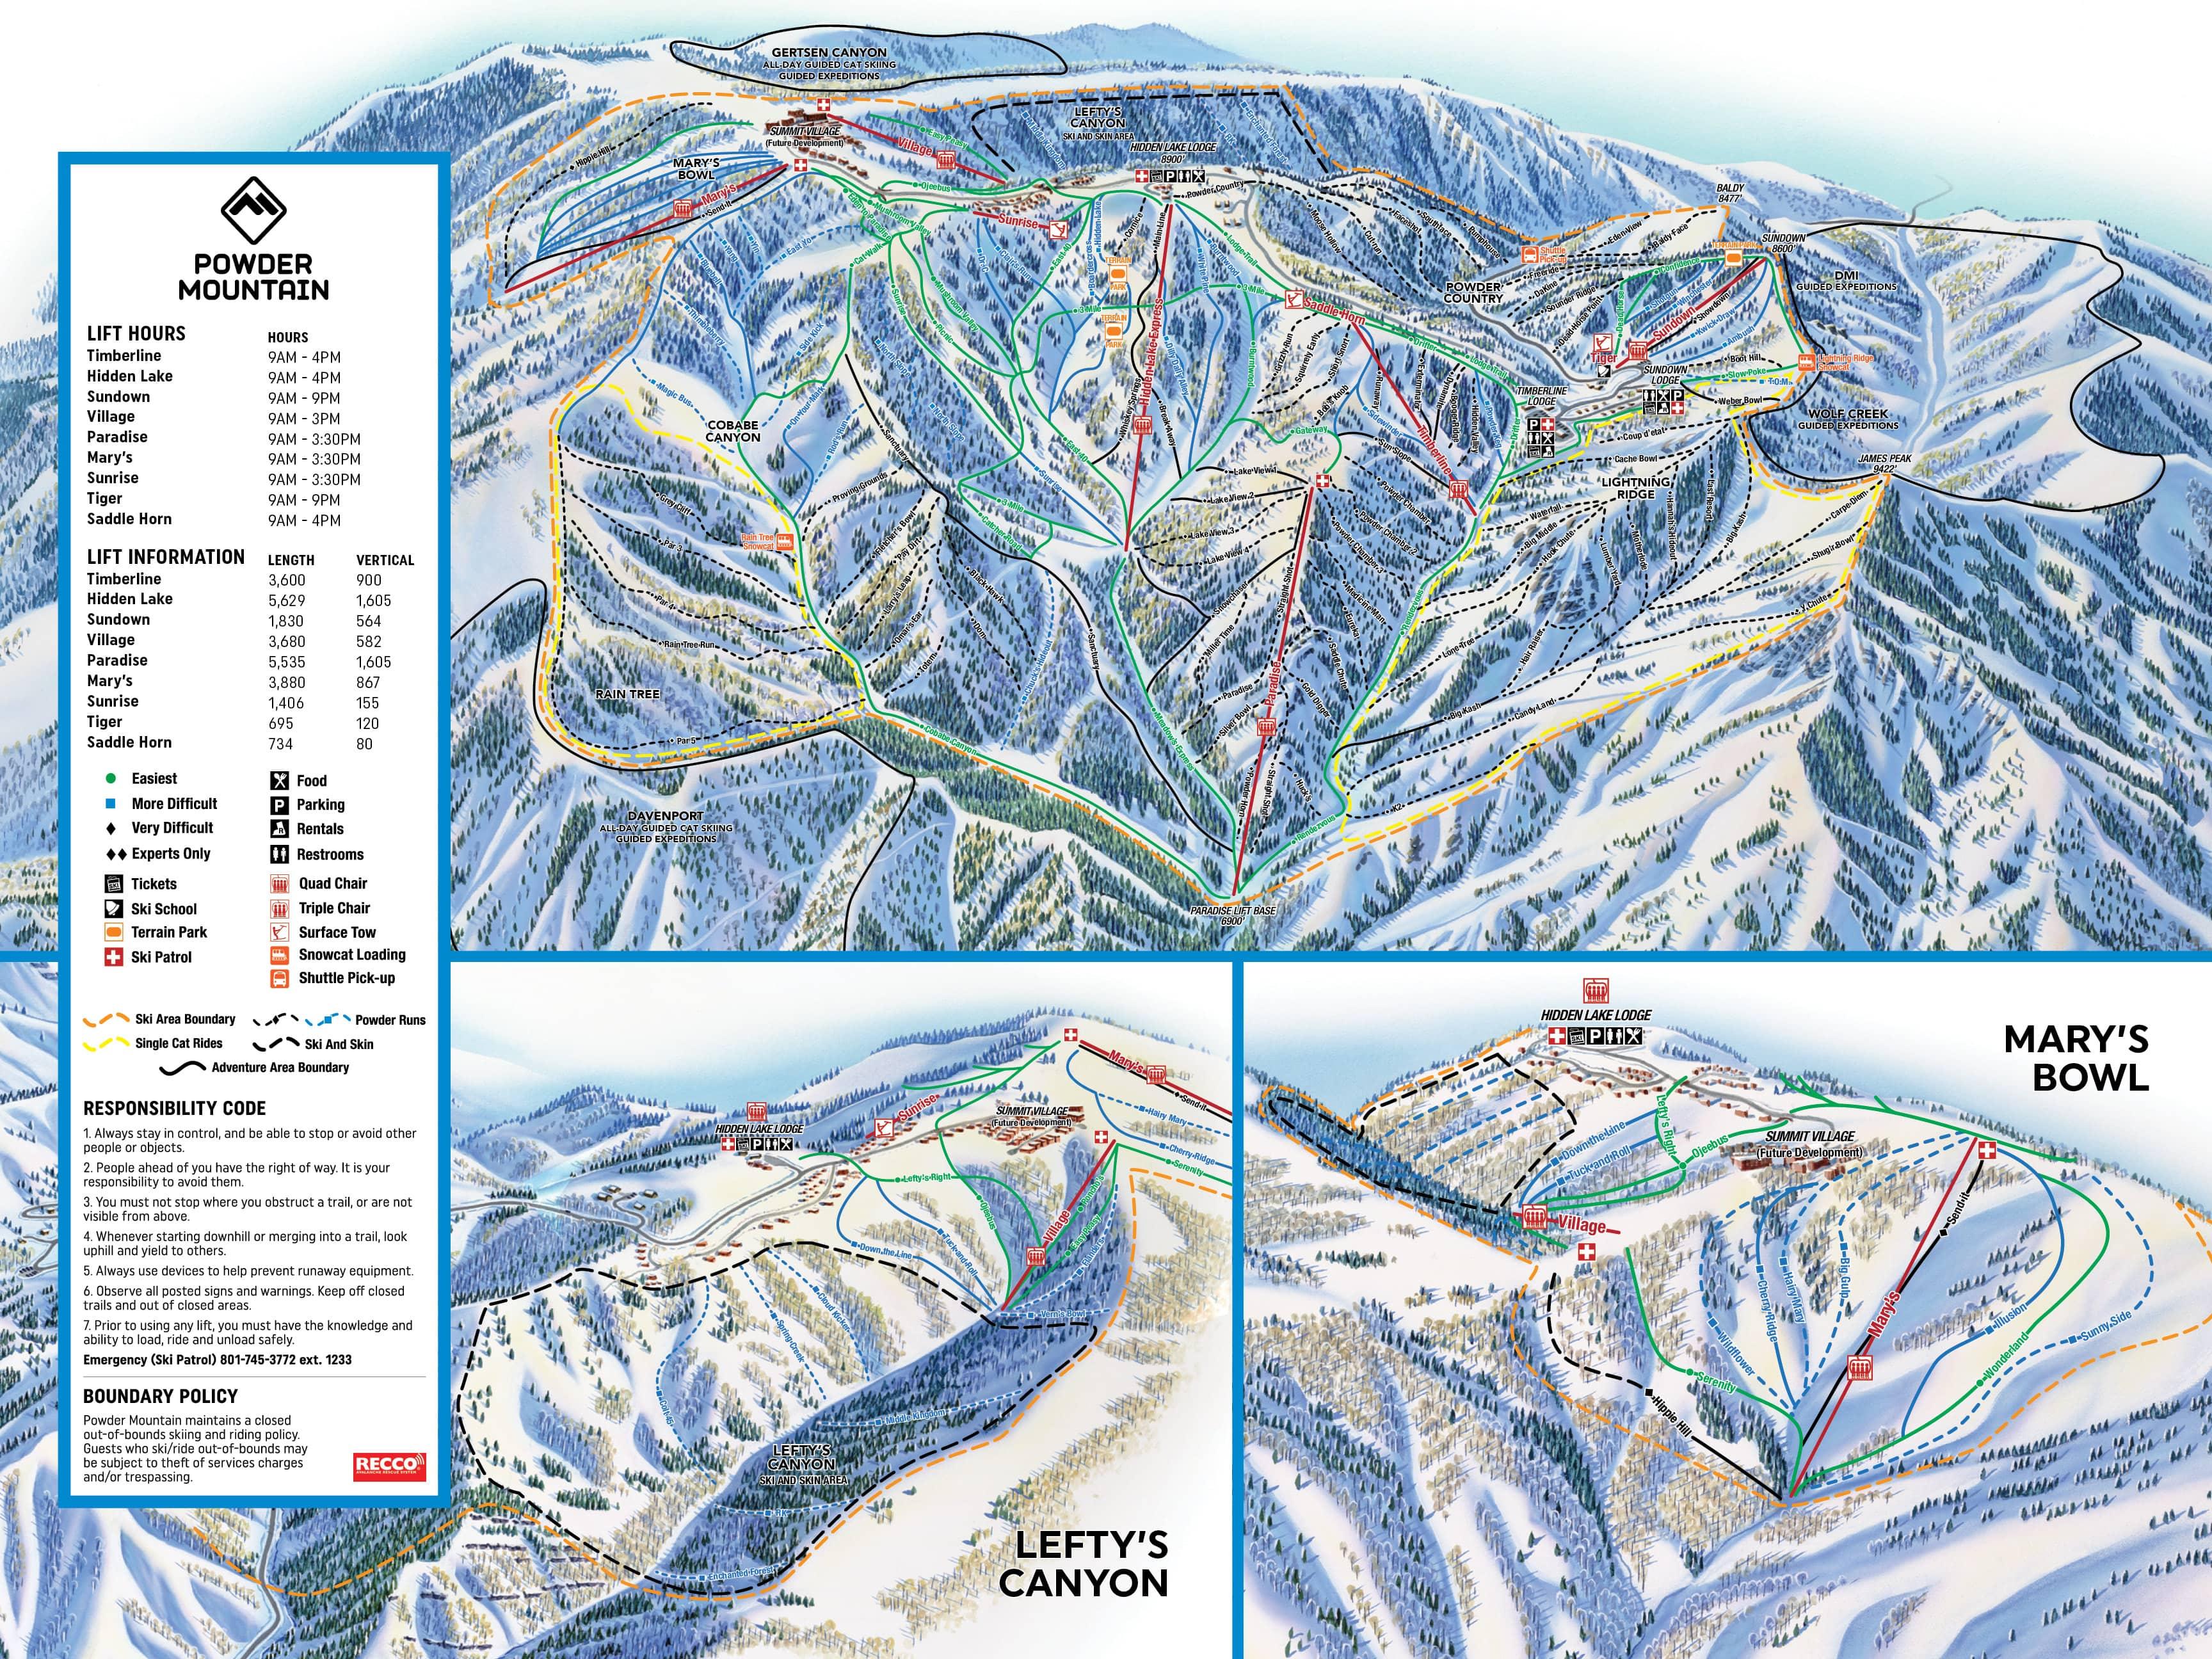 Powder Mountain Catskiing Piste / Trail Map